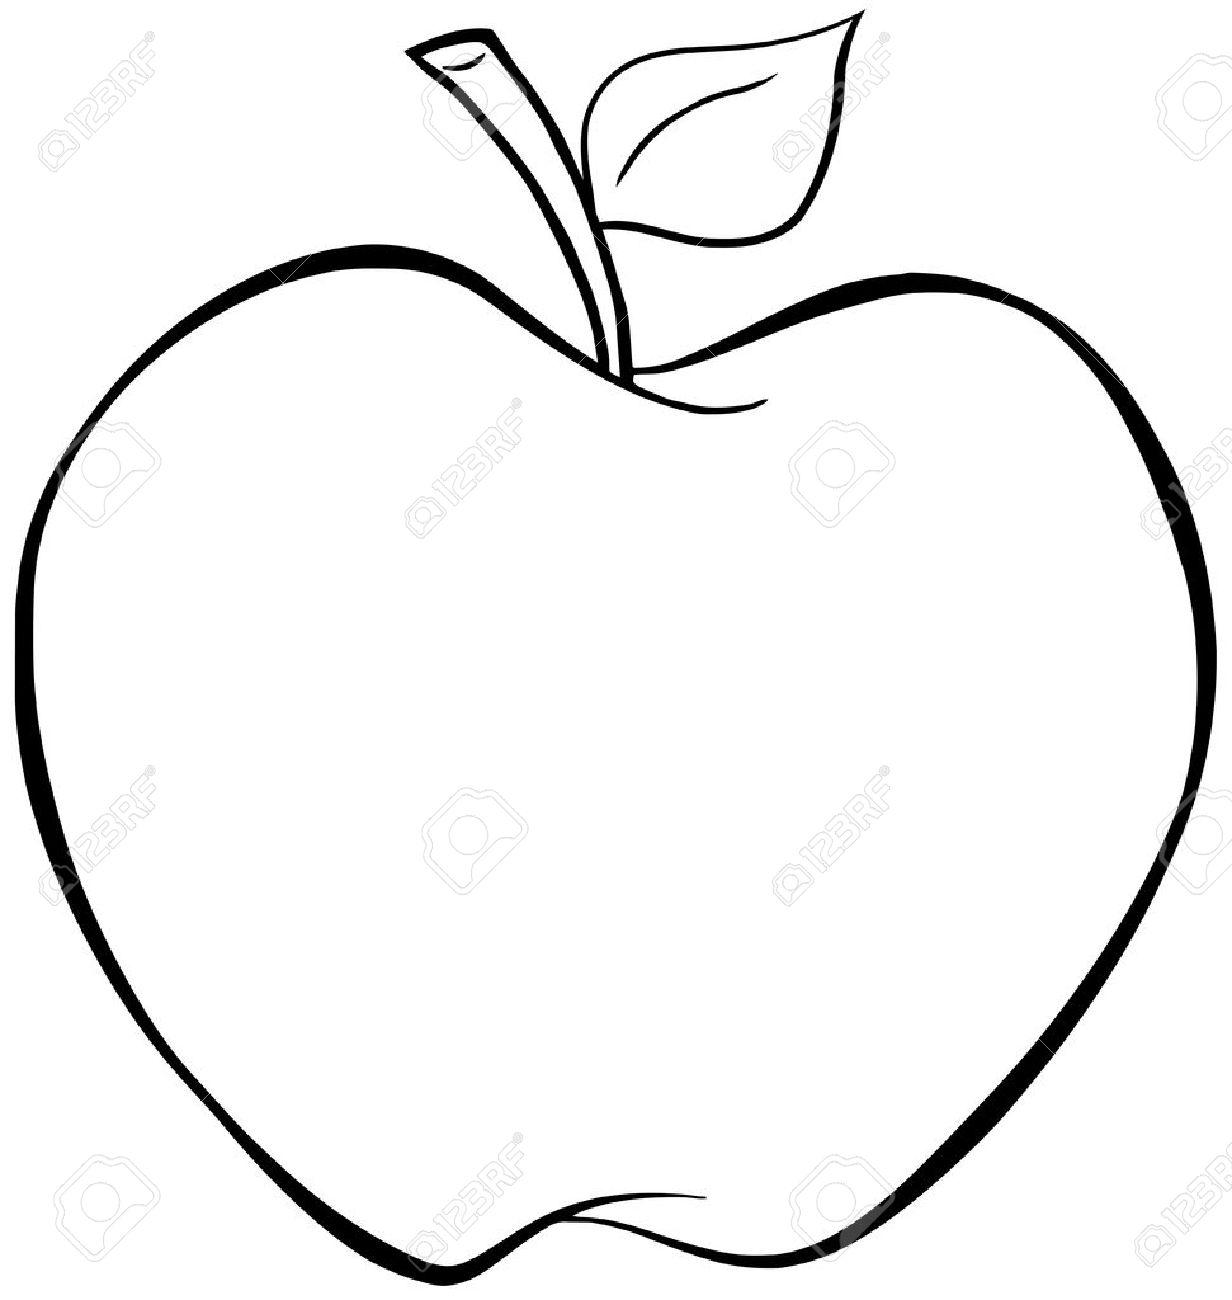 Bitten Apple Drawing At Getdrawings